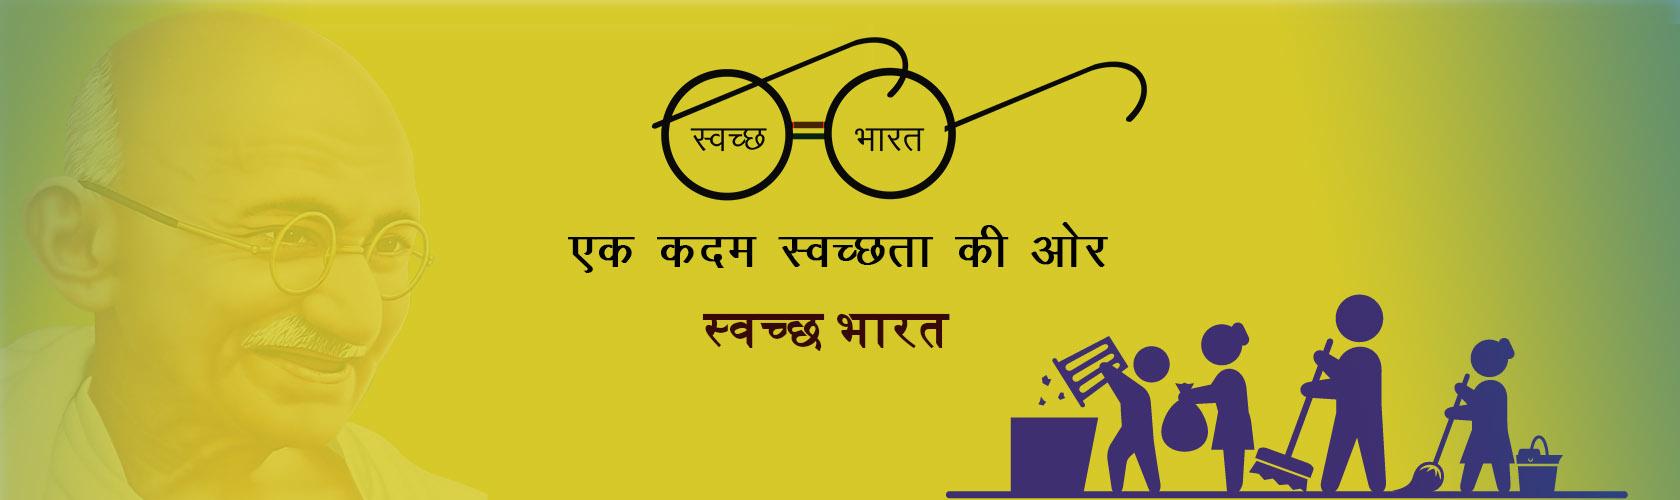 543475148swachta-hindi